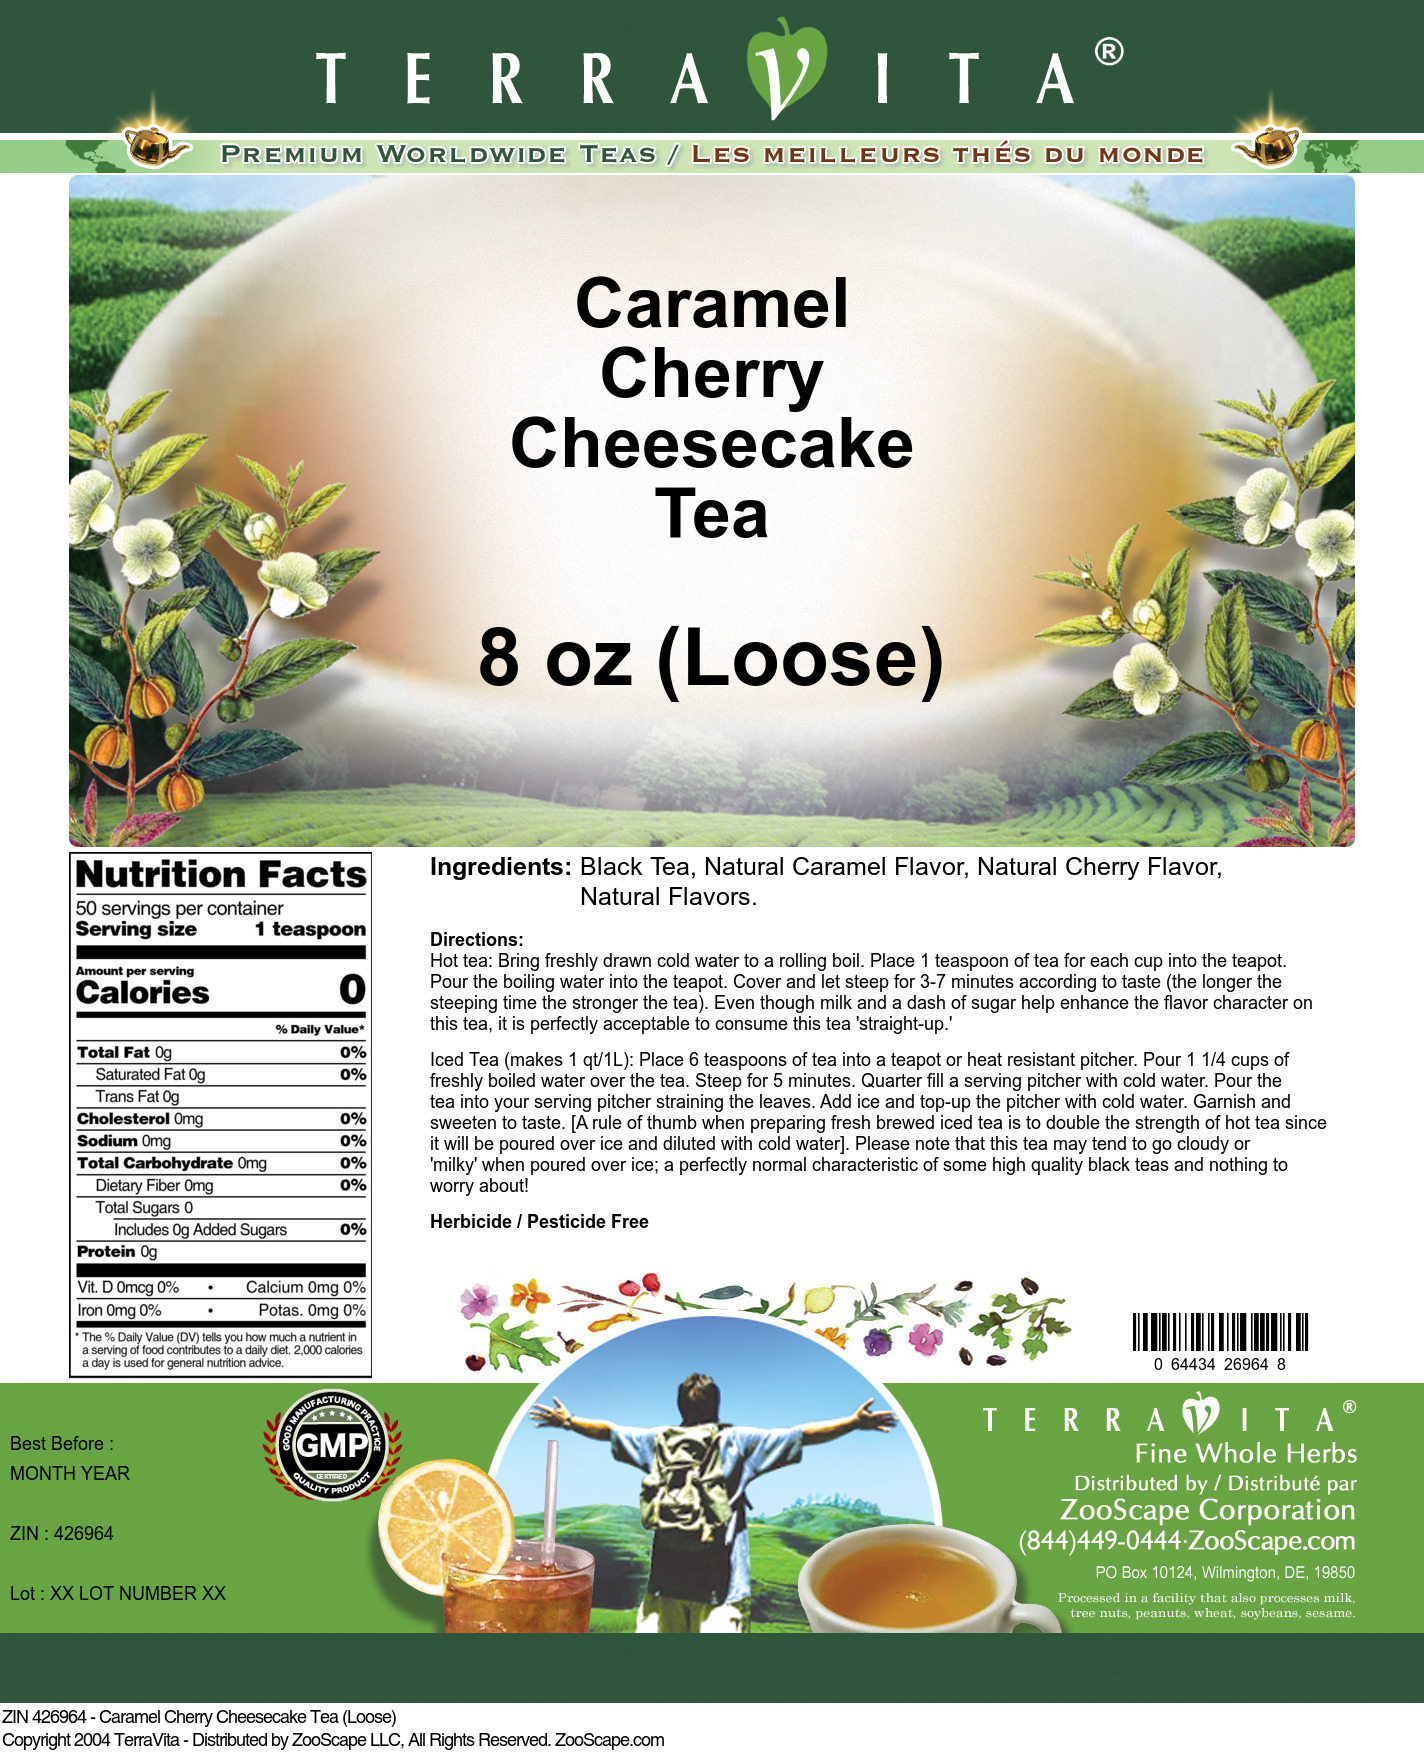 Caramel Cherry Cheesecake Tea (Loose)